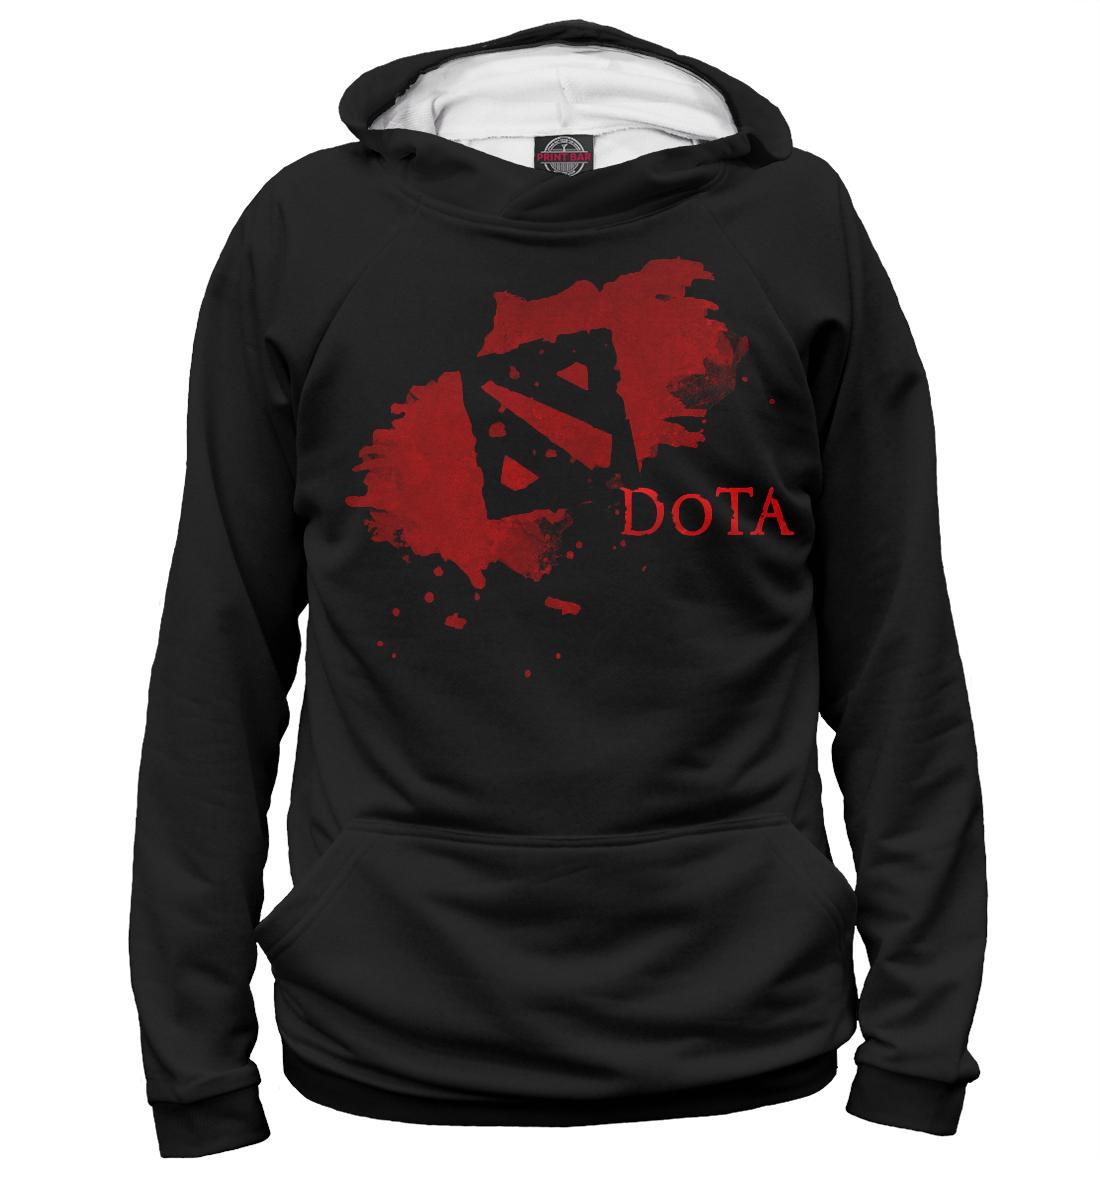 Купить Dota 2 - Fresh Blood, Printbar, Худи, DO2-169641-hud-1